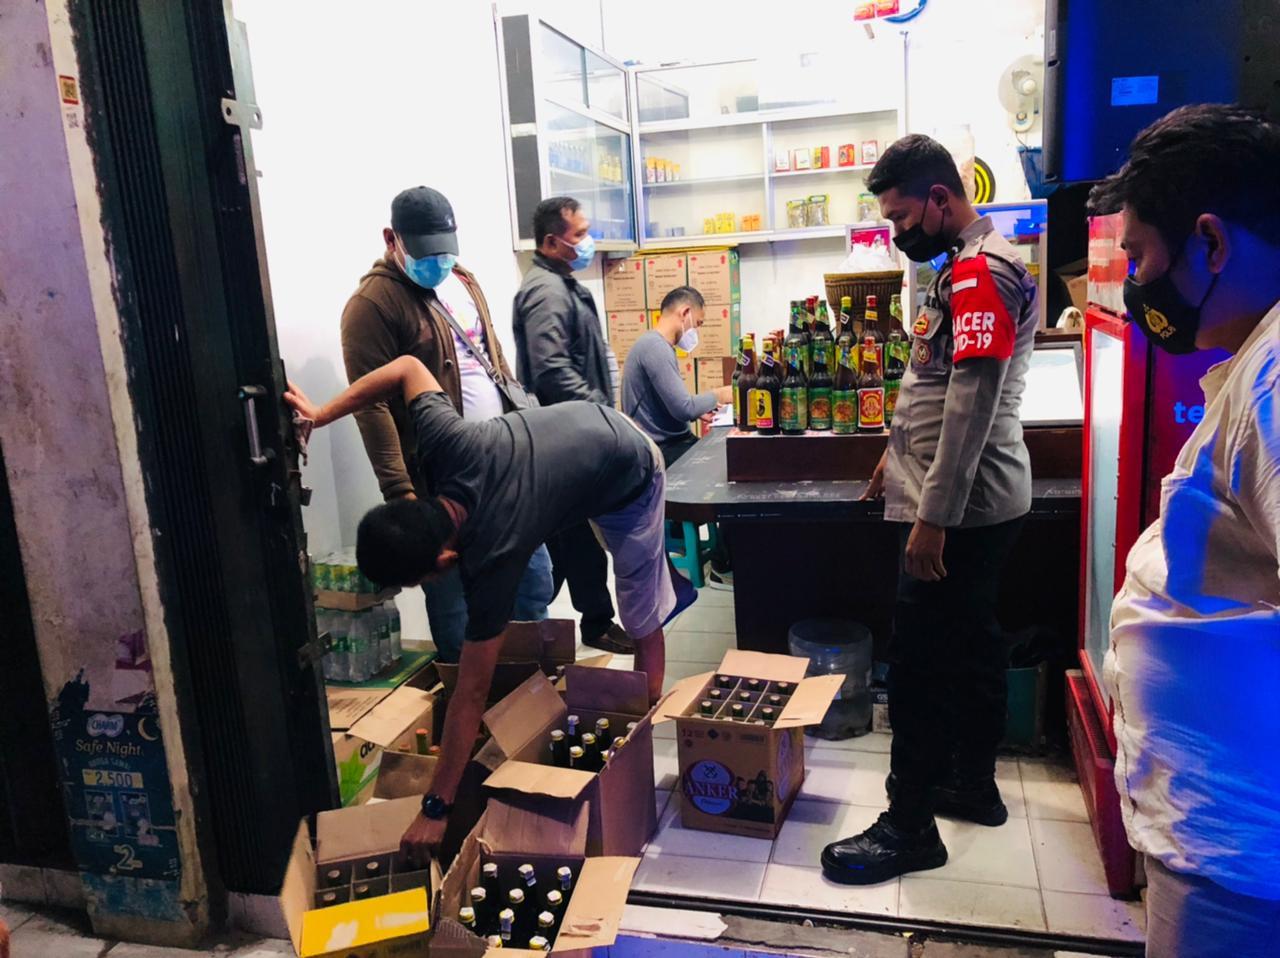 Gambar Berkedok Kios Jamu, Polsek Serang Polres Serang Kota Temukan 133 Botol Miras 17